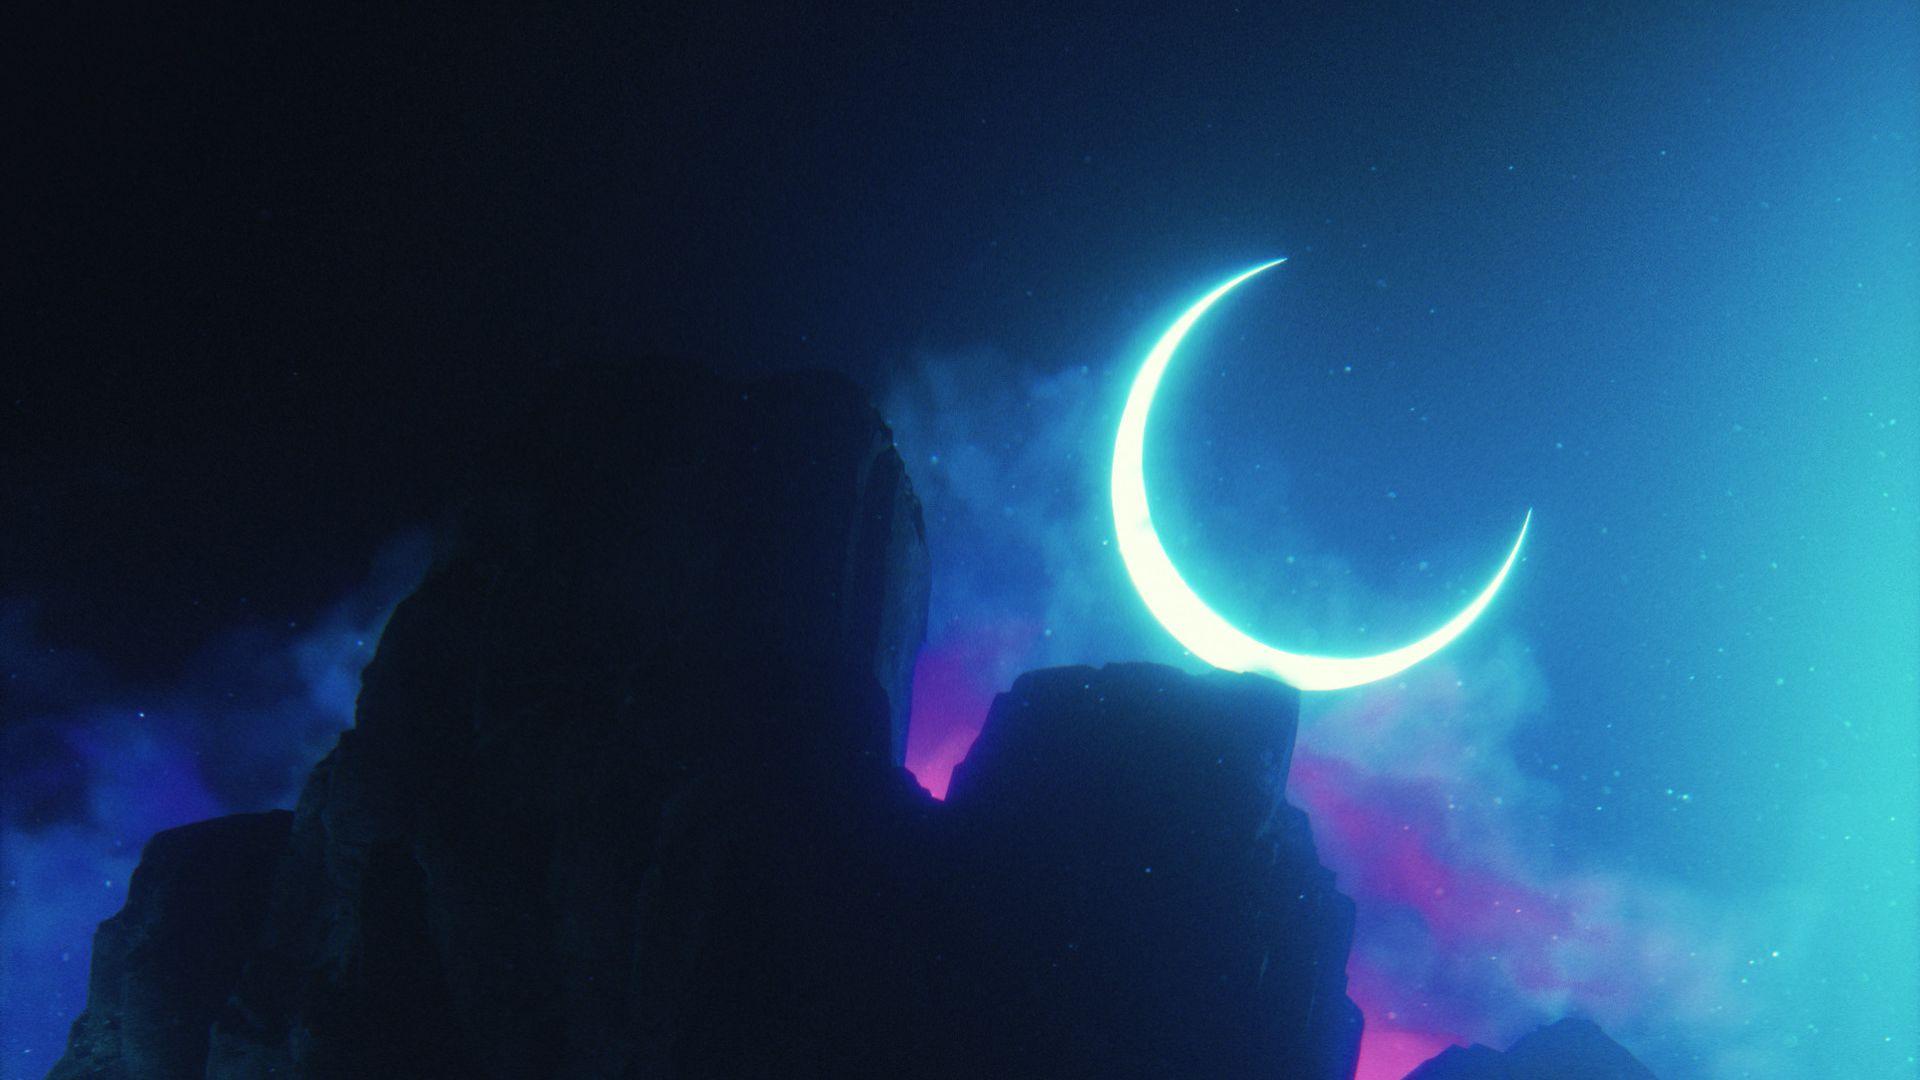 1920x1080 Wallpaper rock, neon, smoke, moon, light, bright